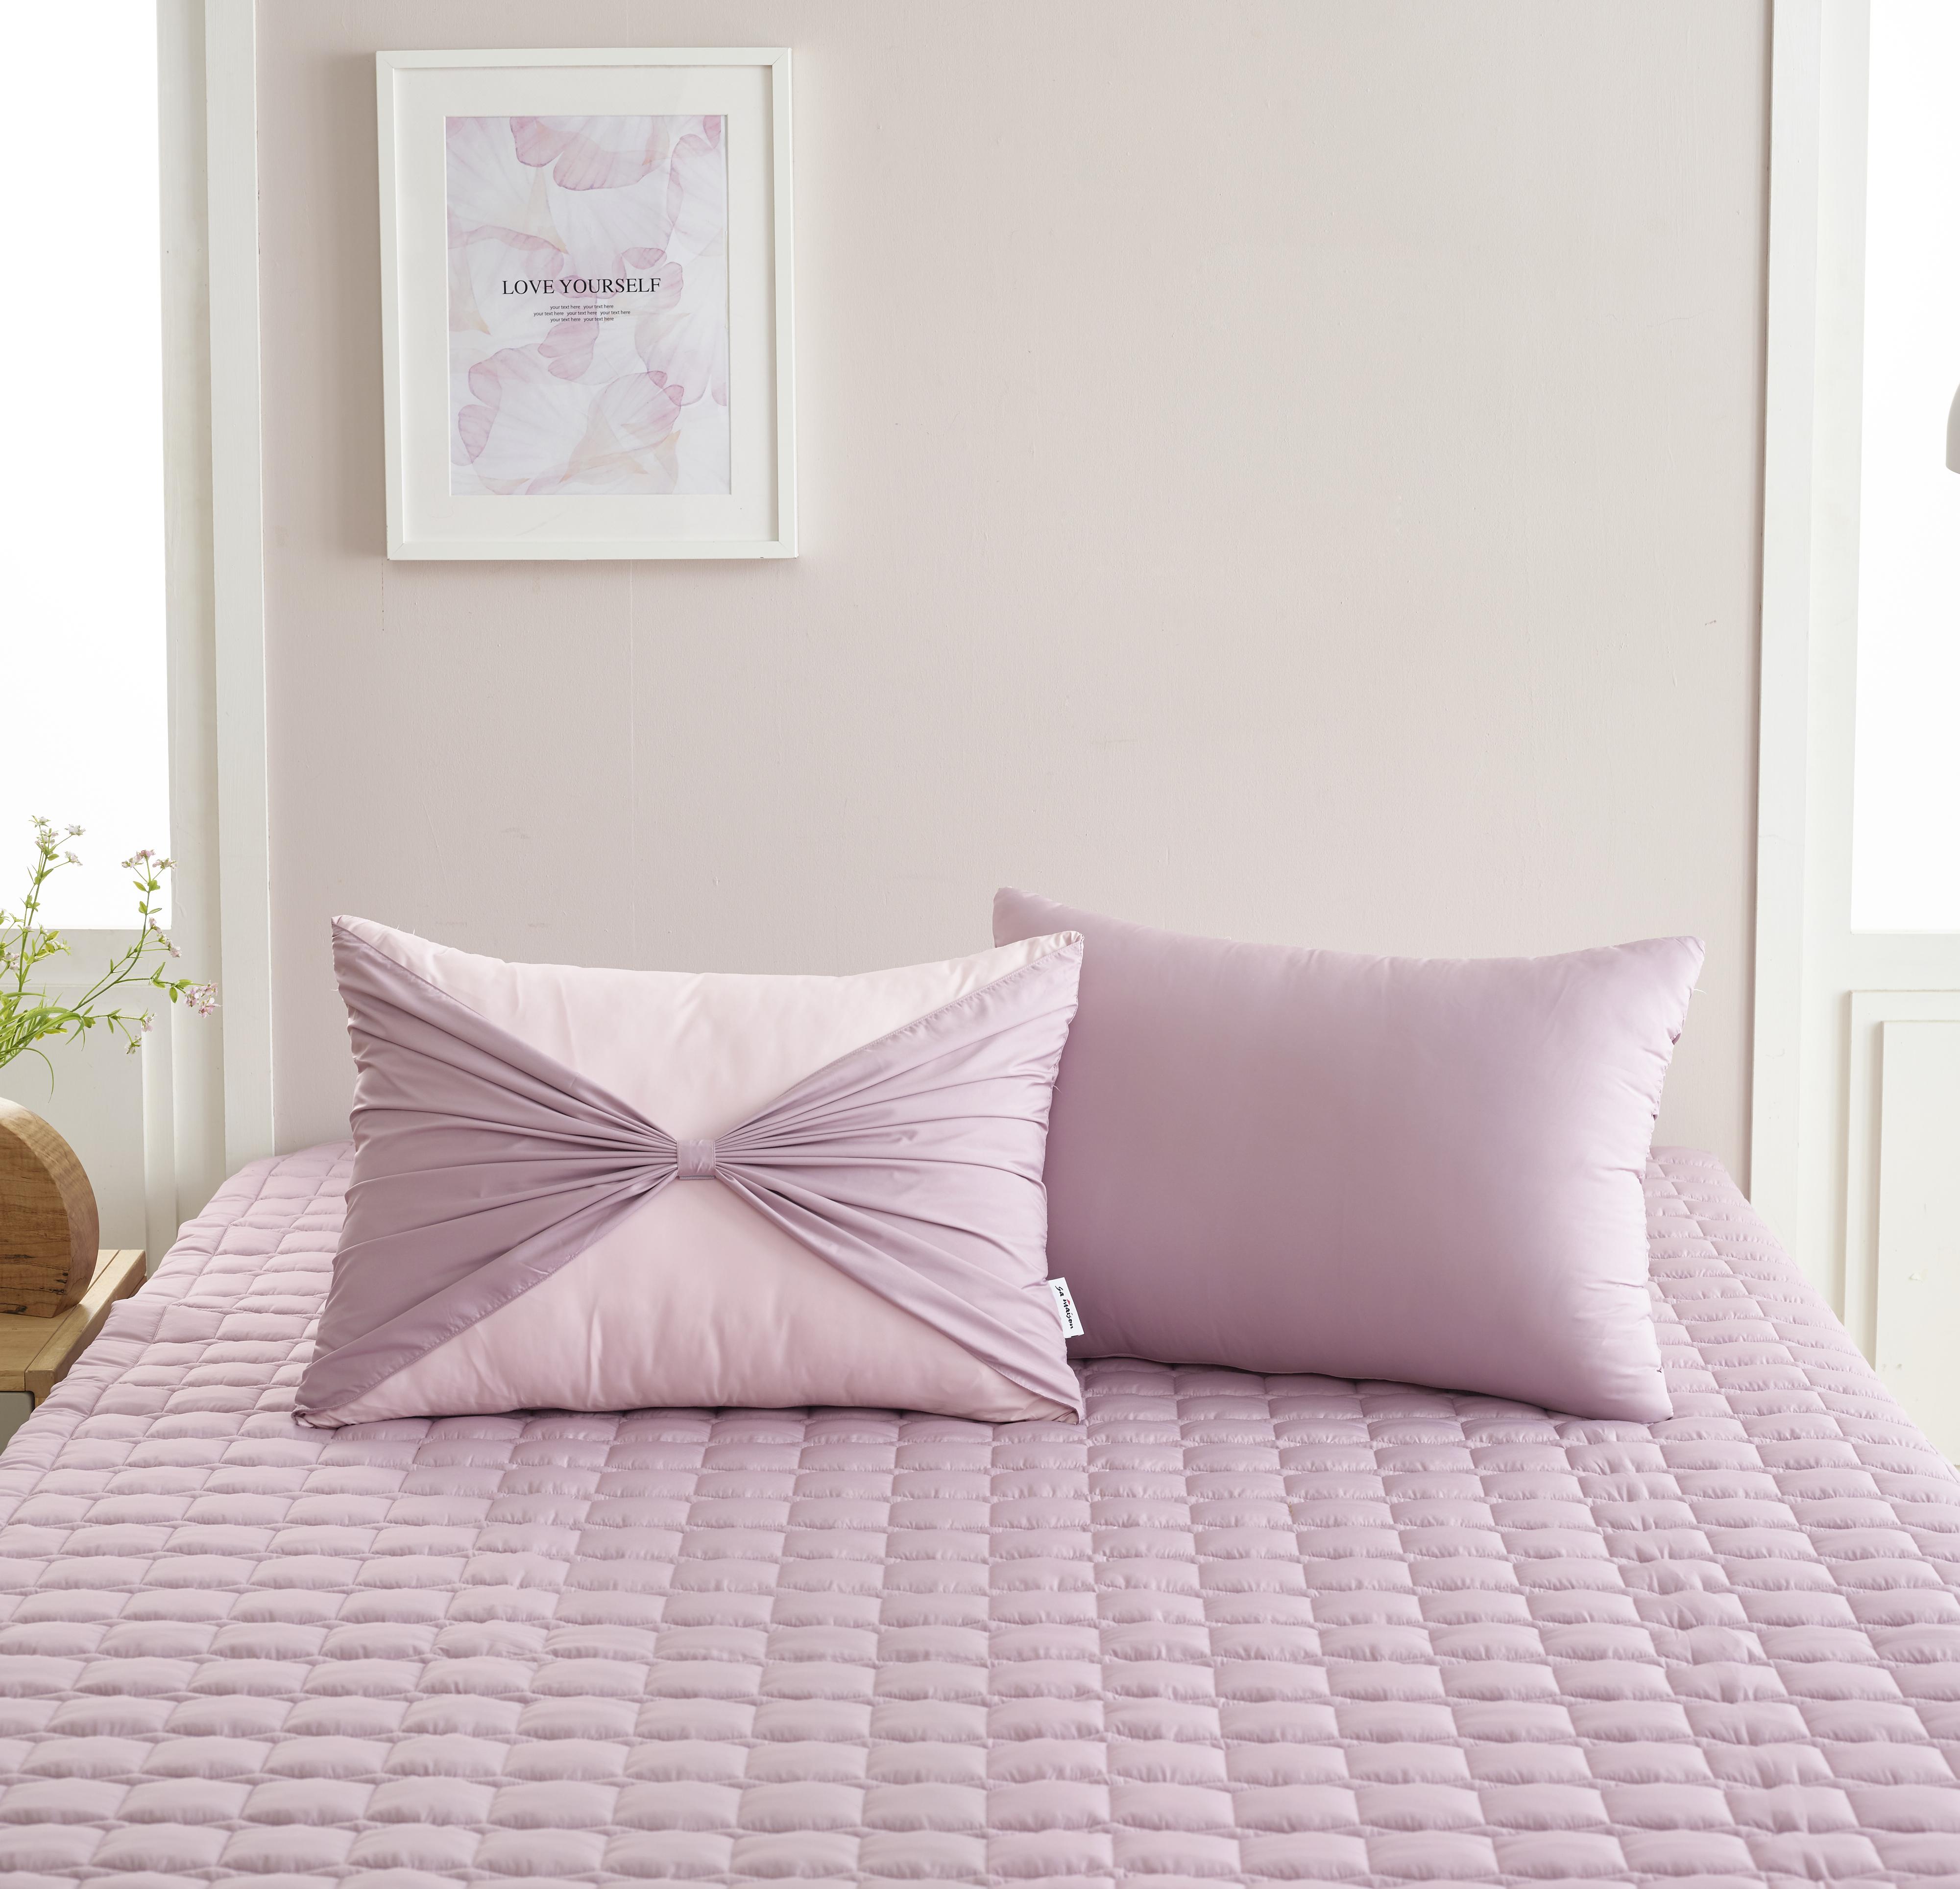 Vỏ gối nơ Sa Maison màu Blossom Pink 45*65cm